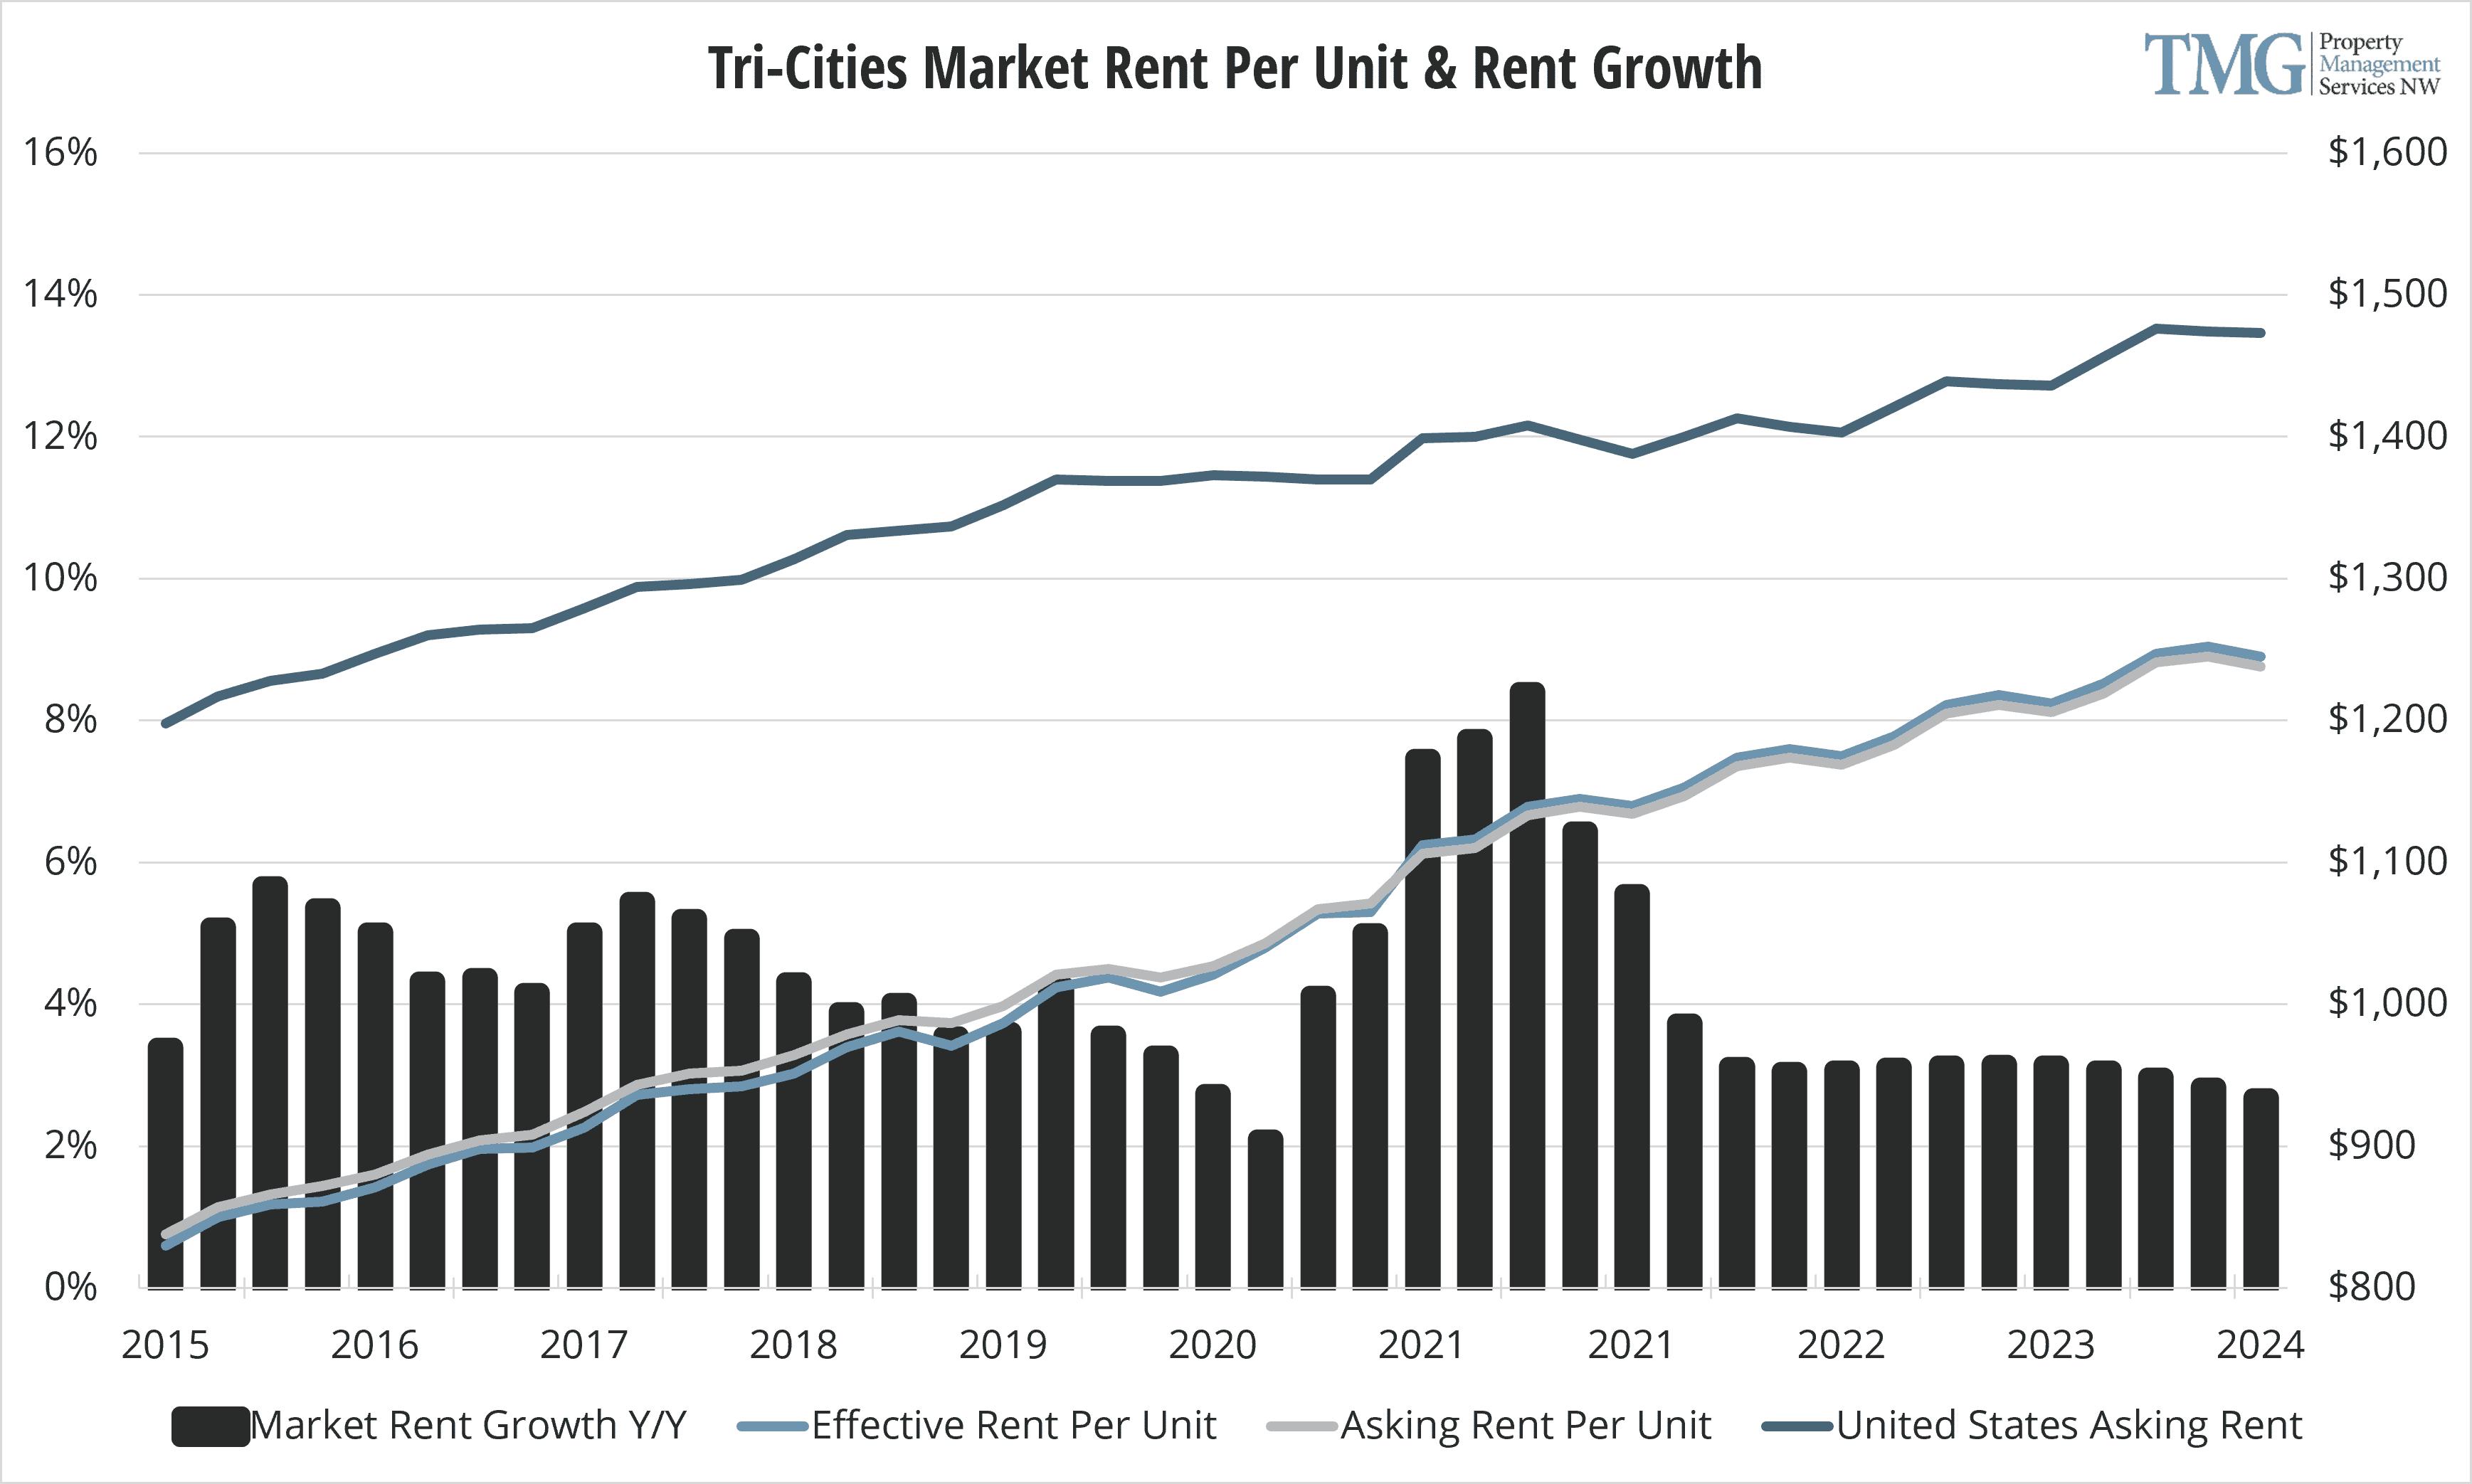 Tri-Cities Q1 2021 Rent Per Unit and Rent Growth